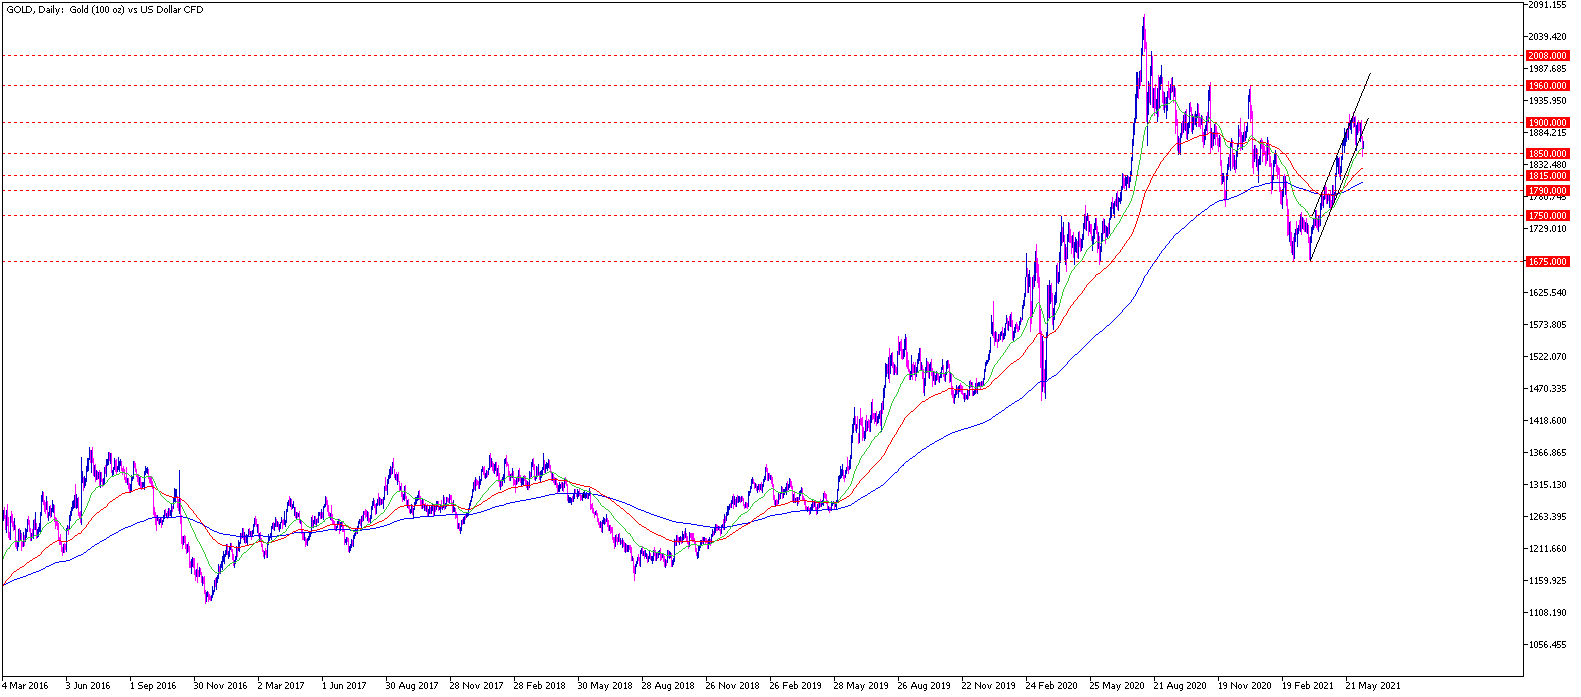 Gold daily Chartanalyse 15.06.21 - Gold Aktuell